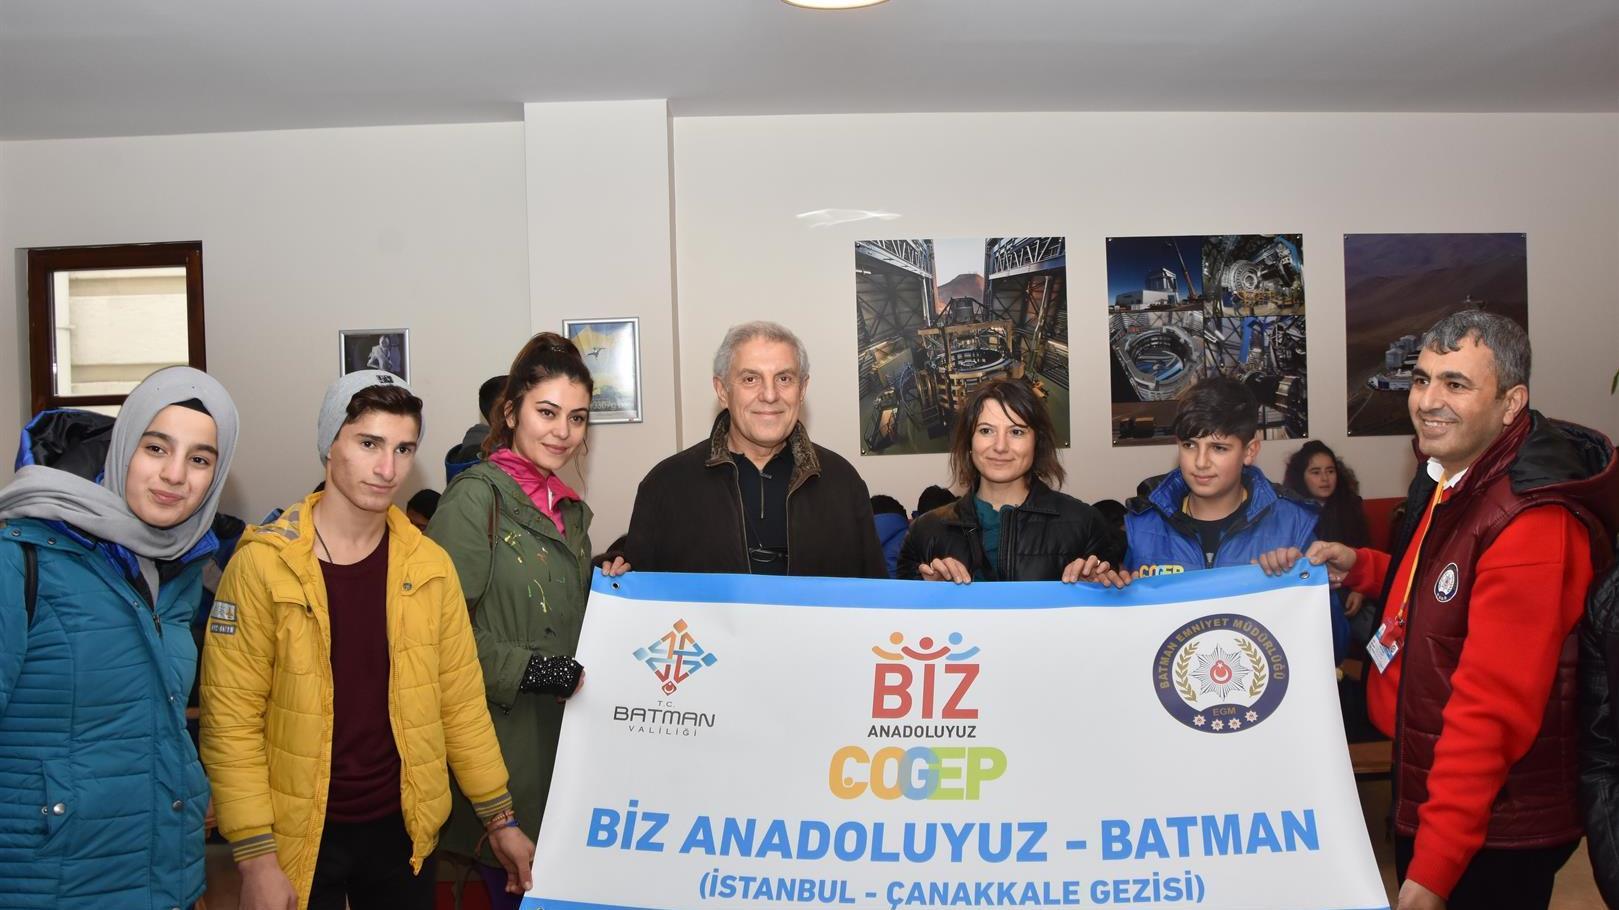 astronomi Biz-Anadoluyuz Gezi üniversite